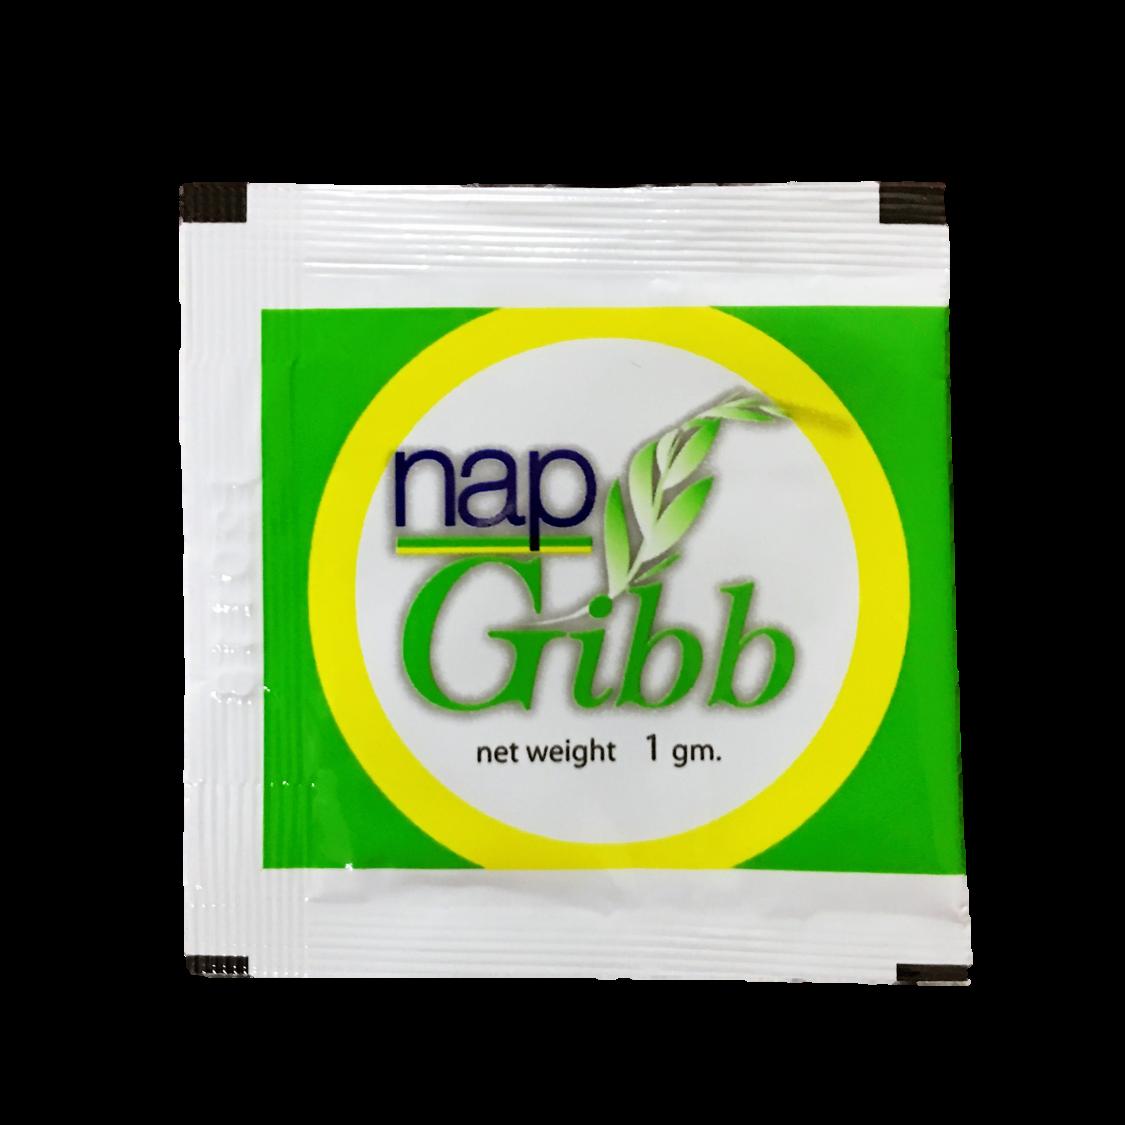 Nap Gibb Gibberellic Acid Plant Growth Regulator 1gm x 5 Packets Plus Additional FREE 3 Packets (PROMOTION) (White)